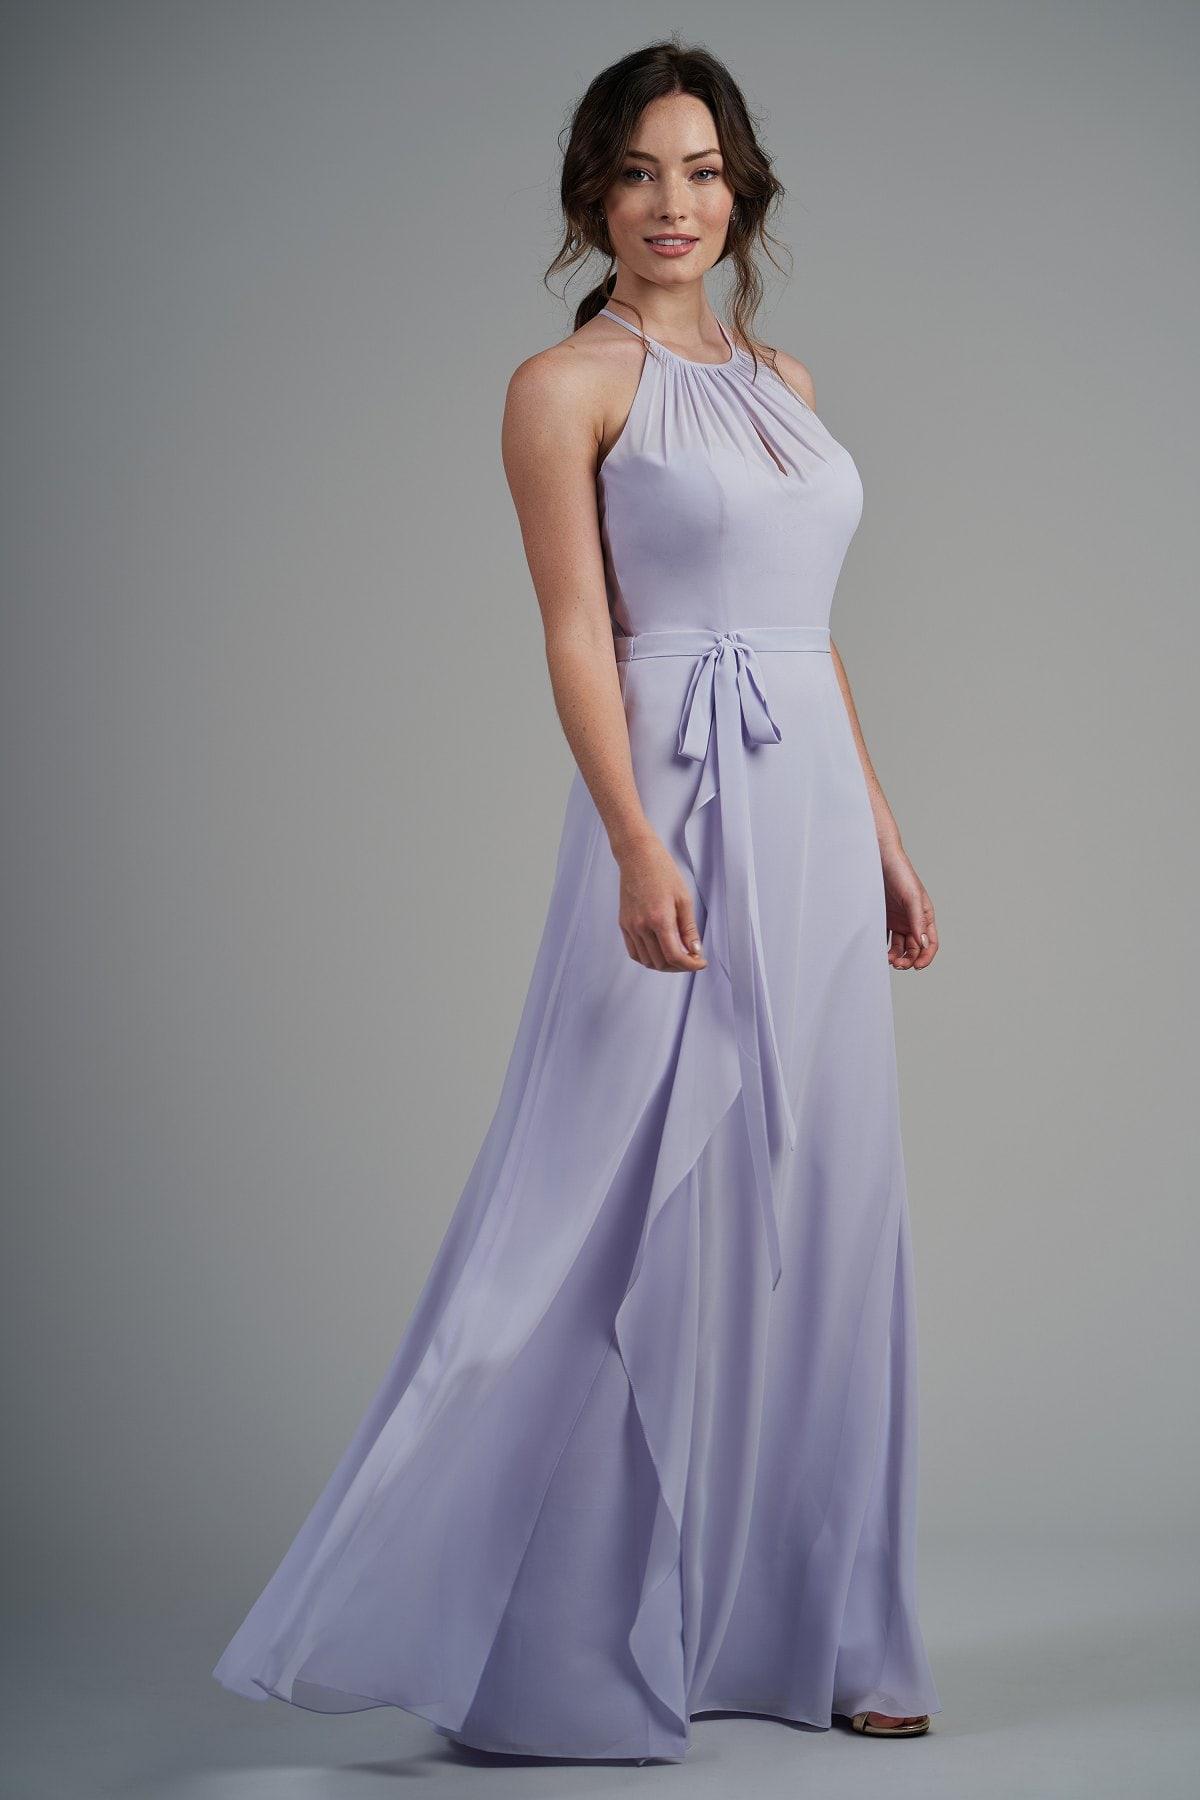 B2 bridesmaid dresses